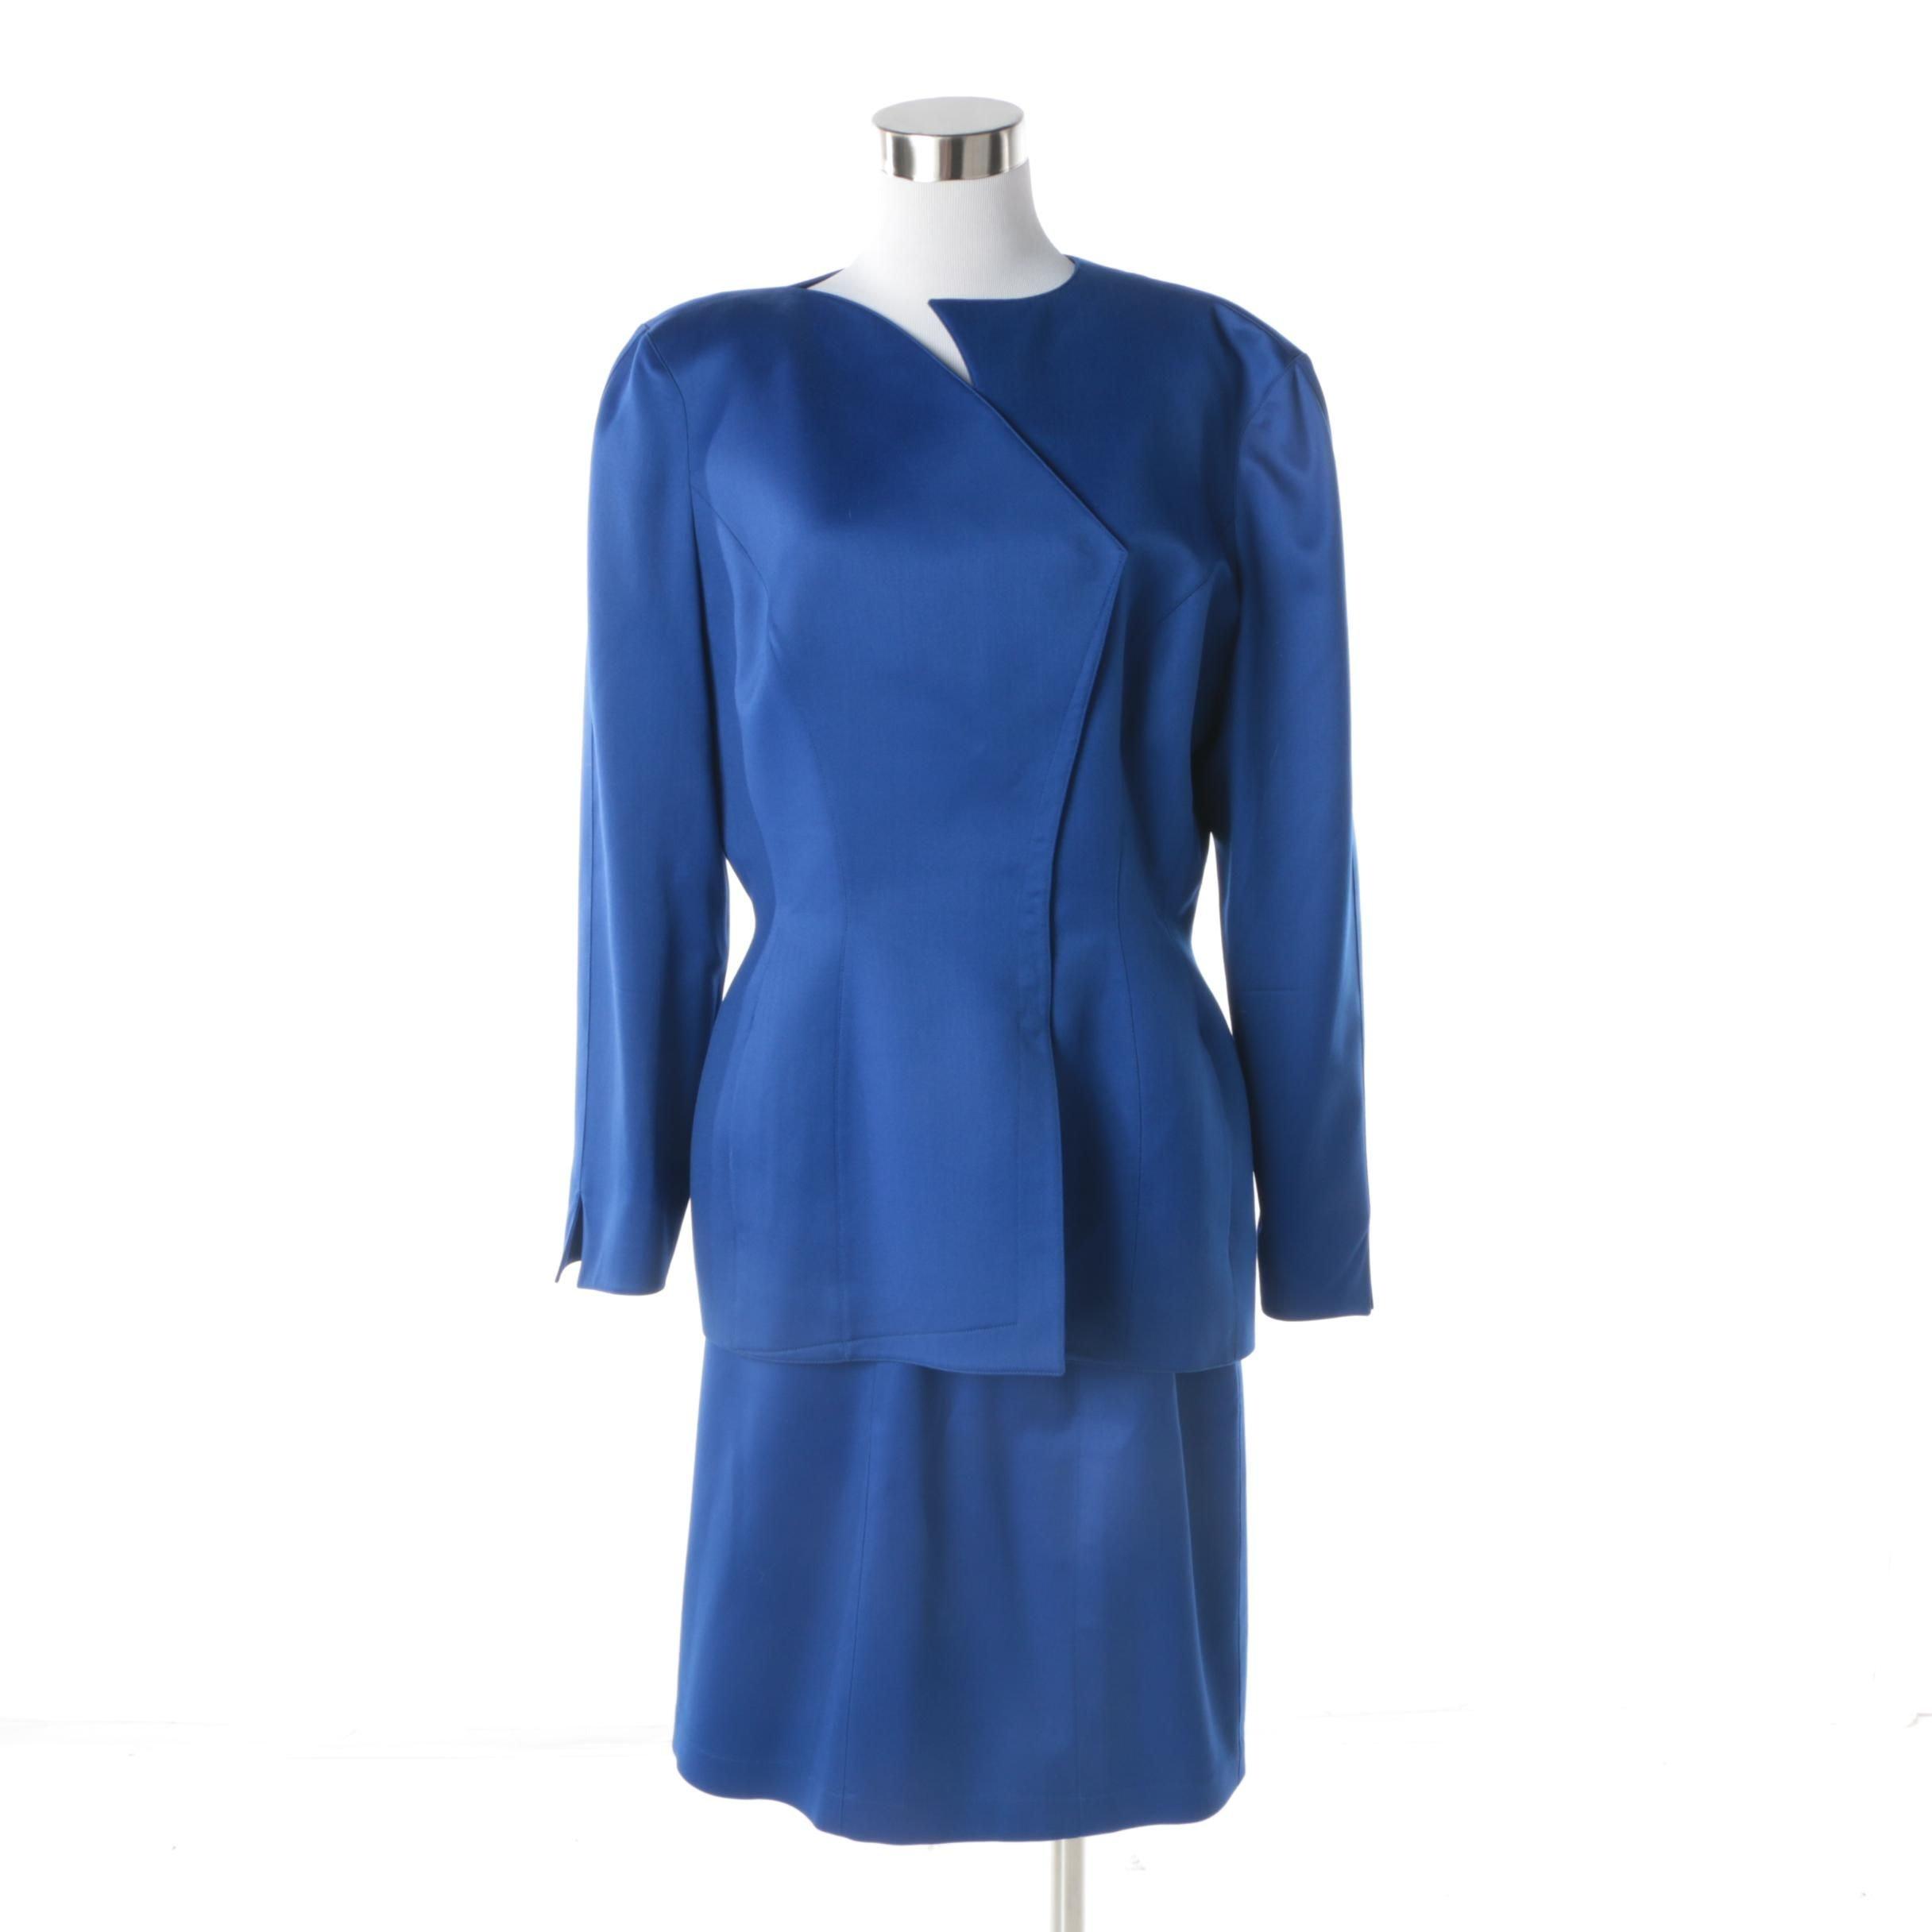 Circa 1980s Vintage Thierry Mugler of Paris Cobalt Blue Skirt Suit